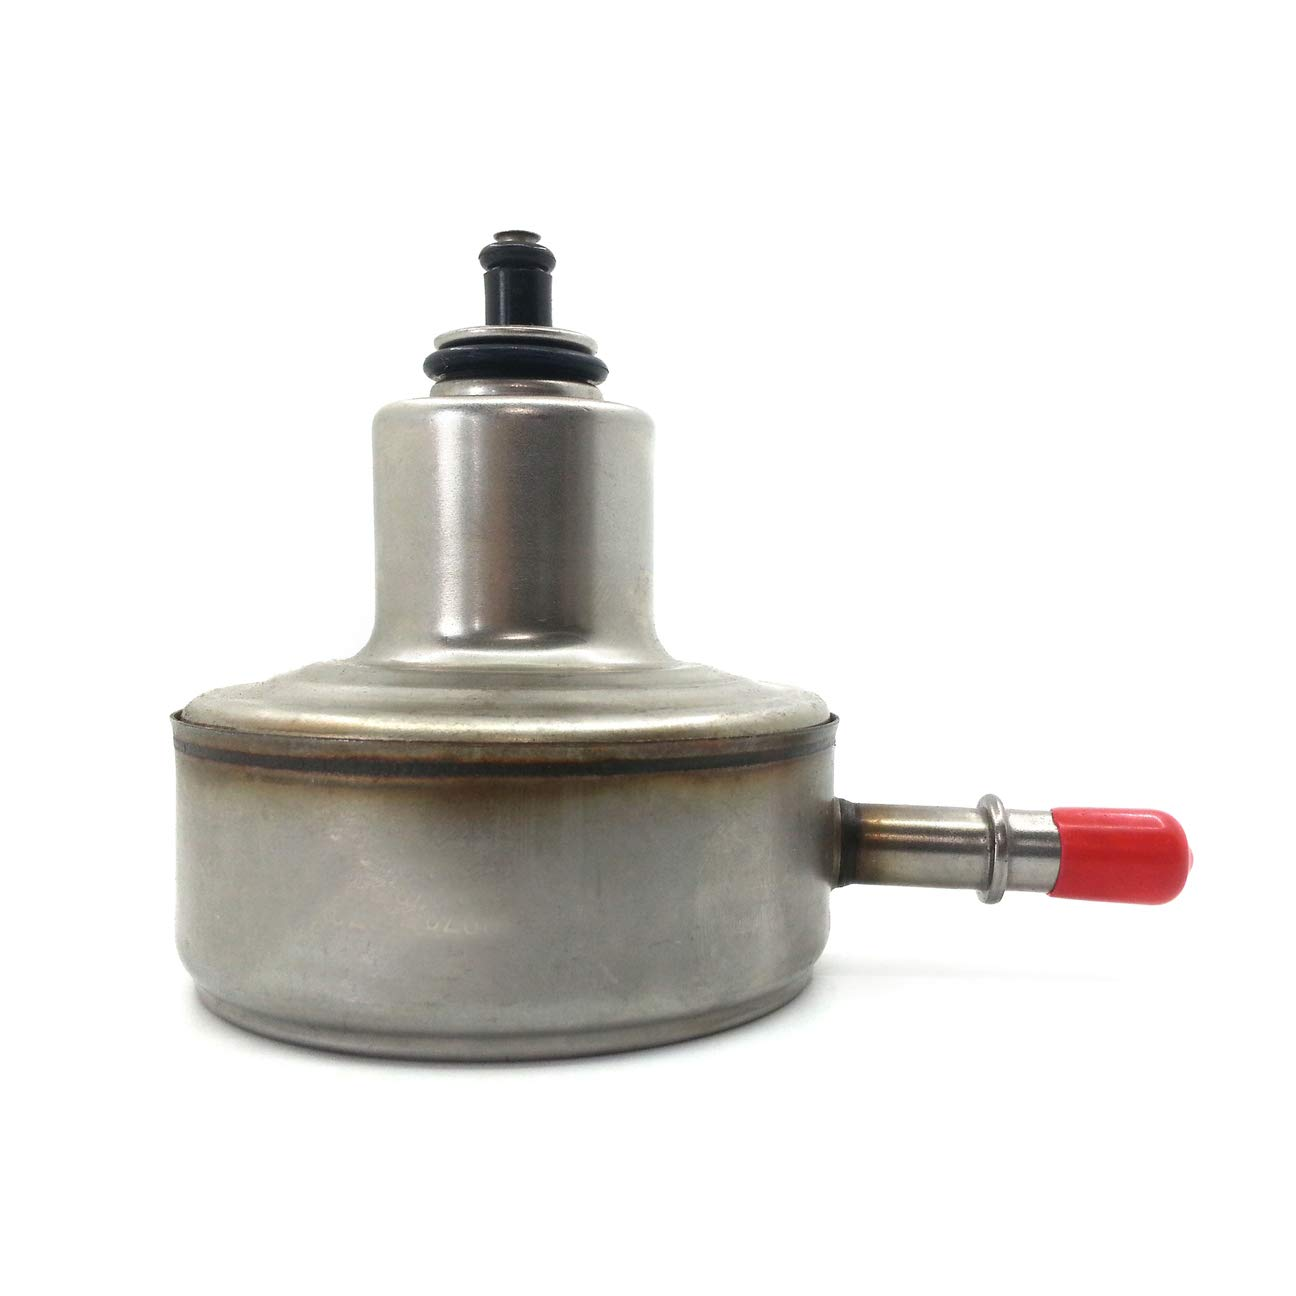 SKP SKPR318 Fuel Pressure Regulator